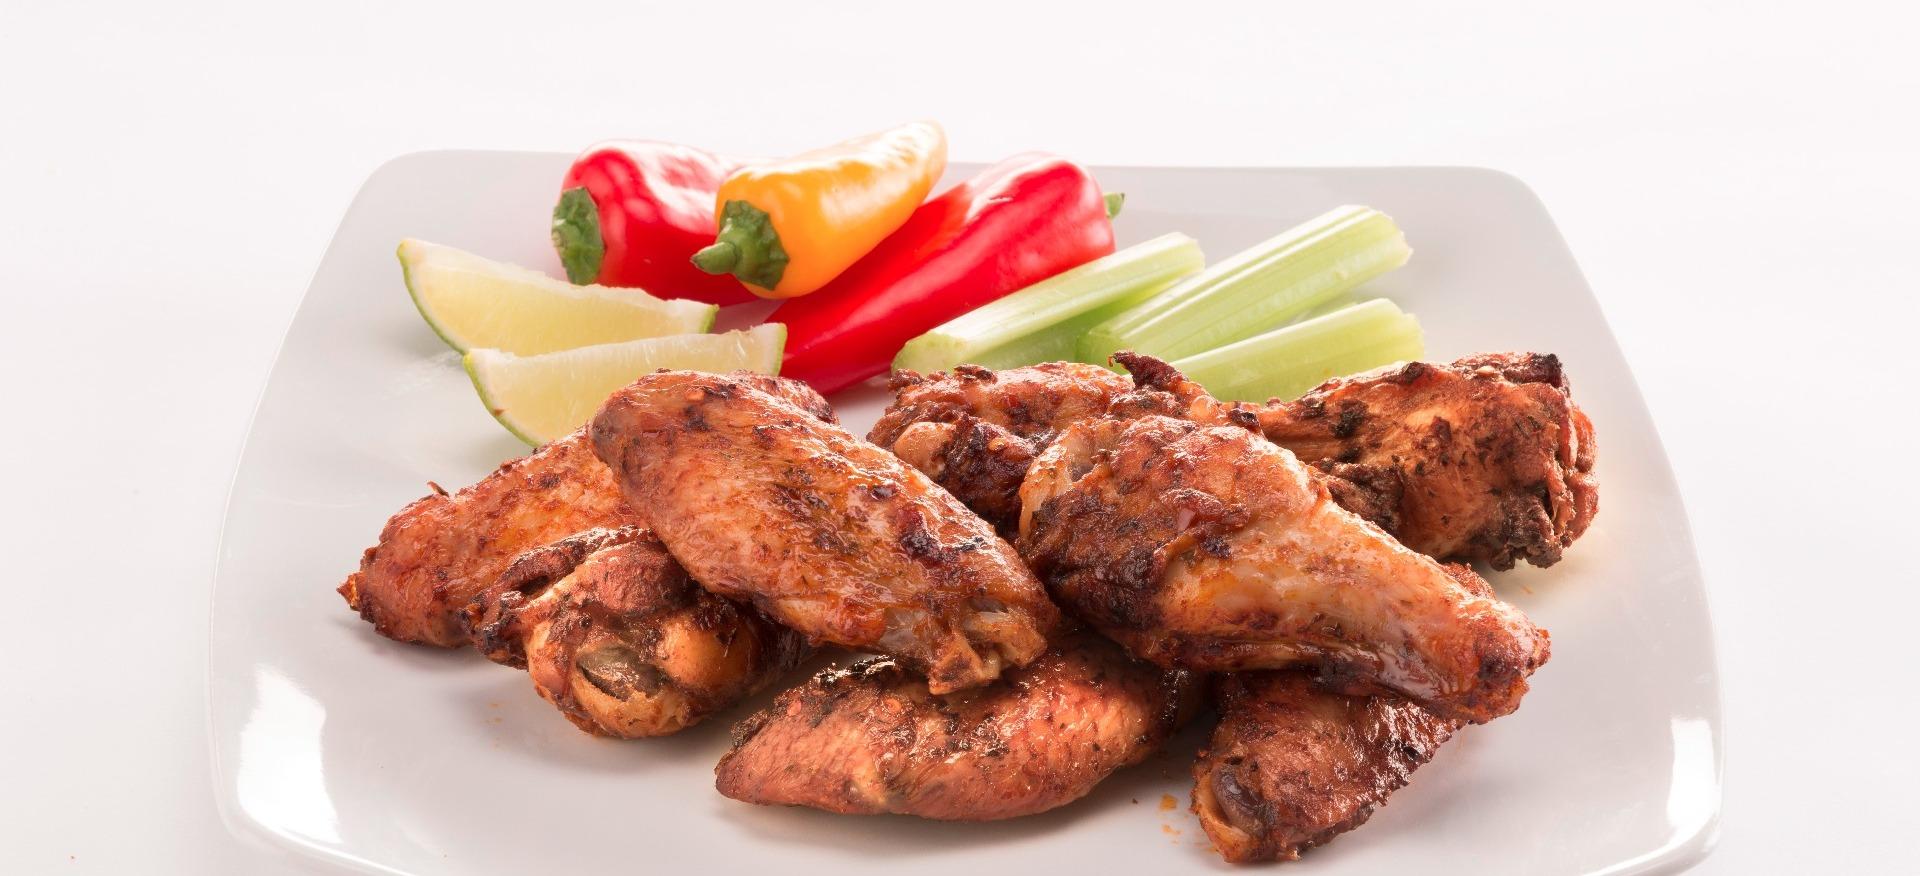 Al Shamas Food   Halal Frozen Food Products